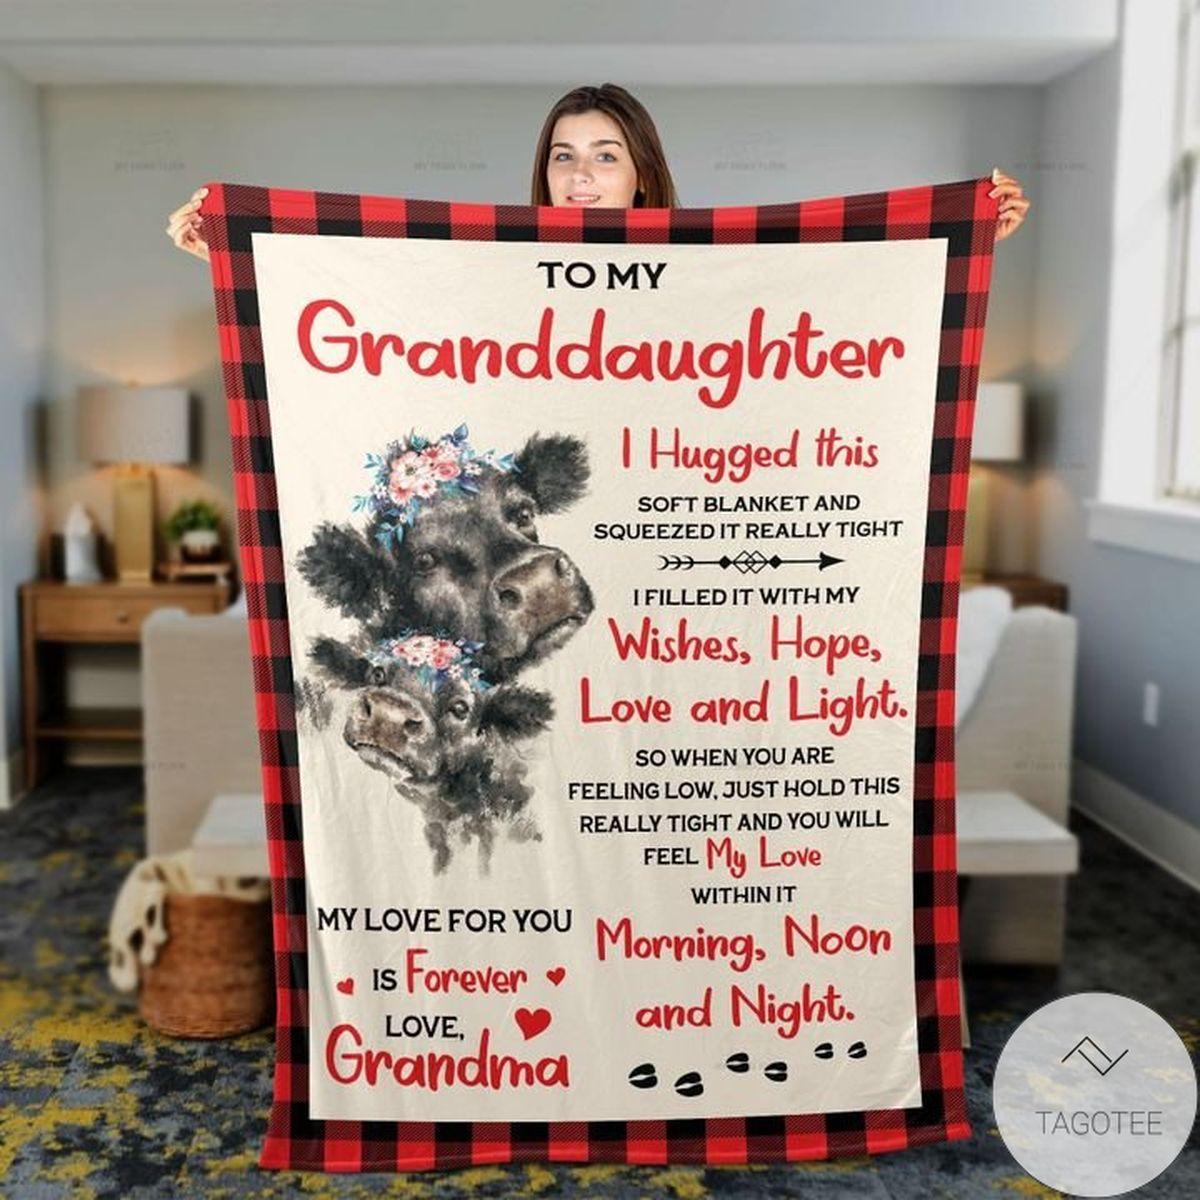 Grandma To Granddaughter Black Angus Cattle Lovers Premium Blankets